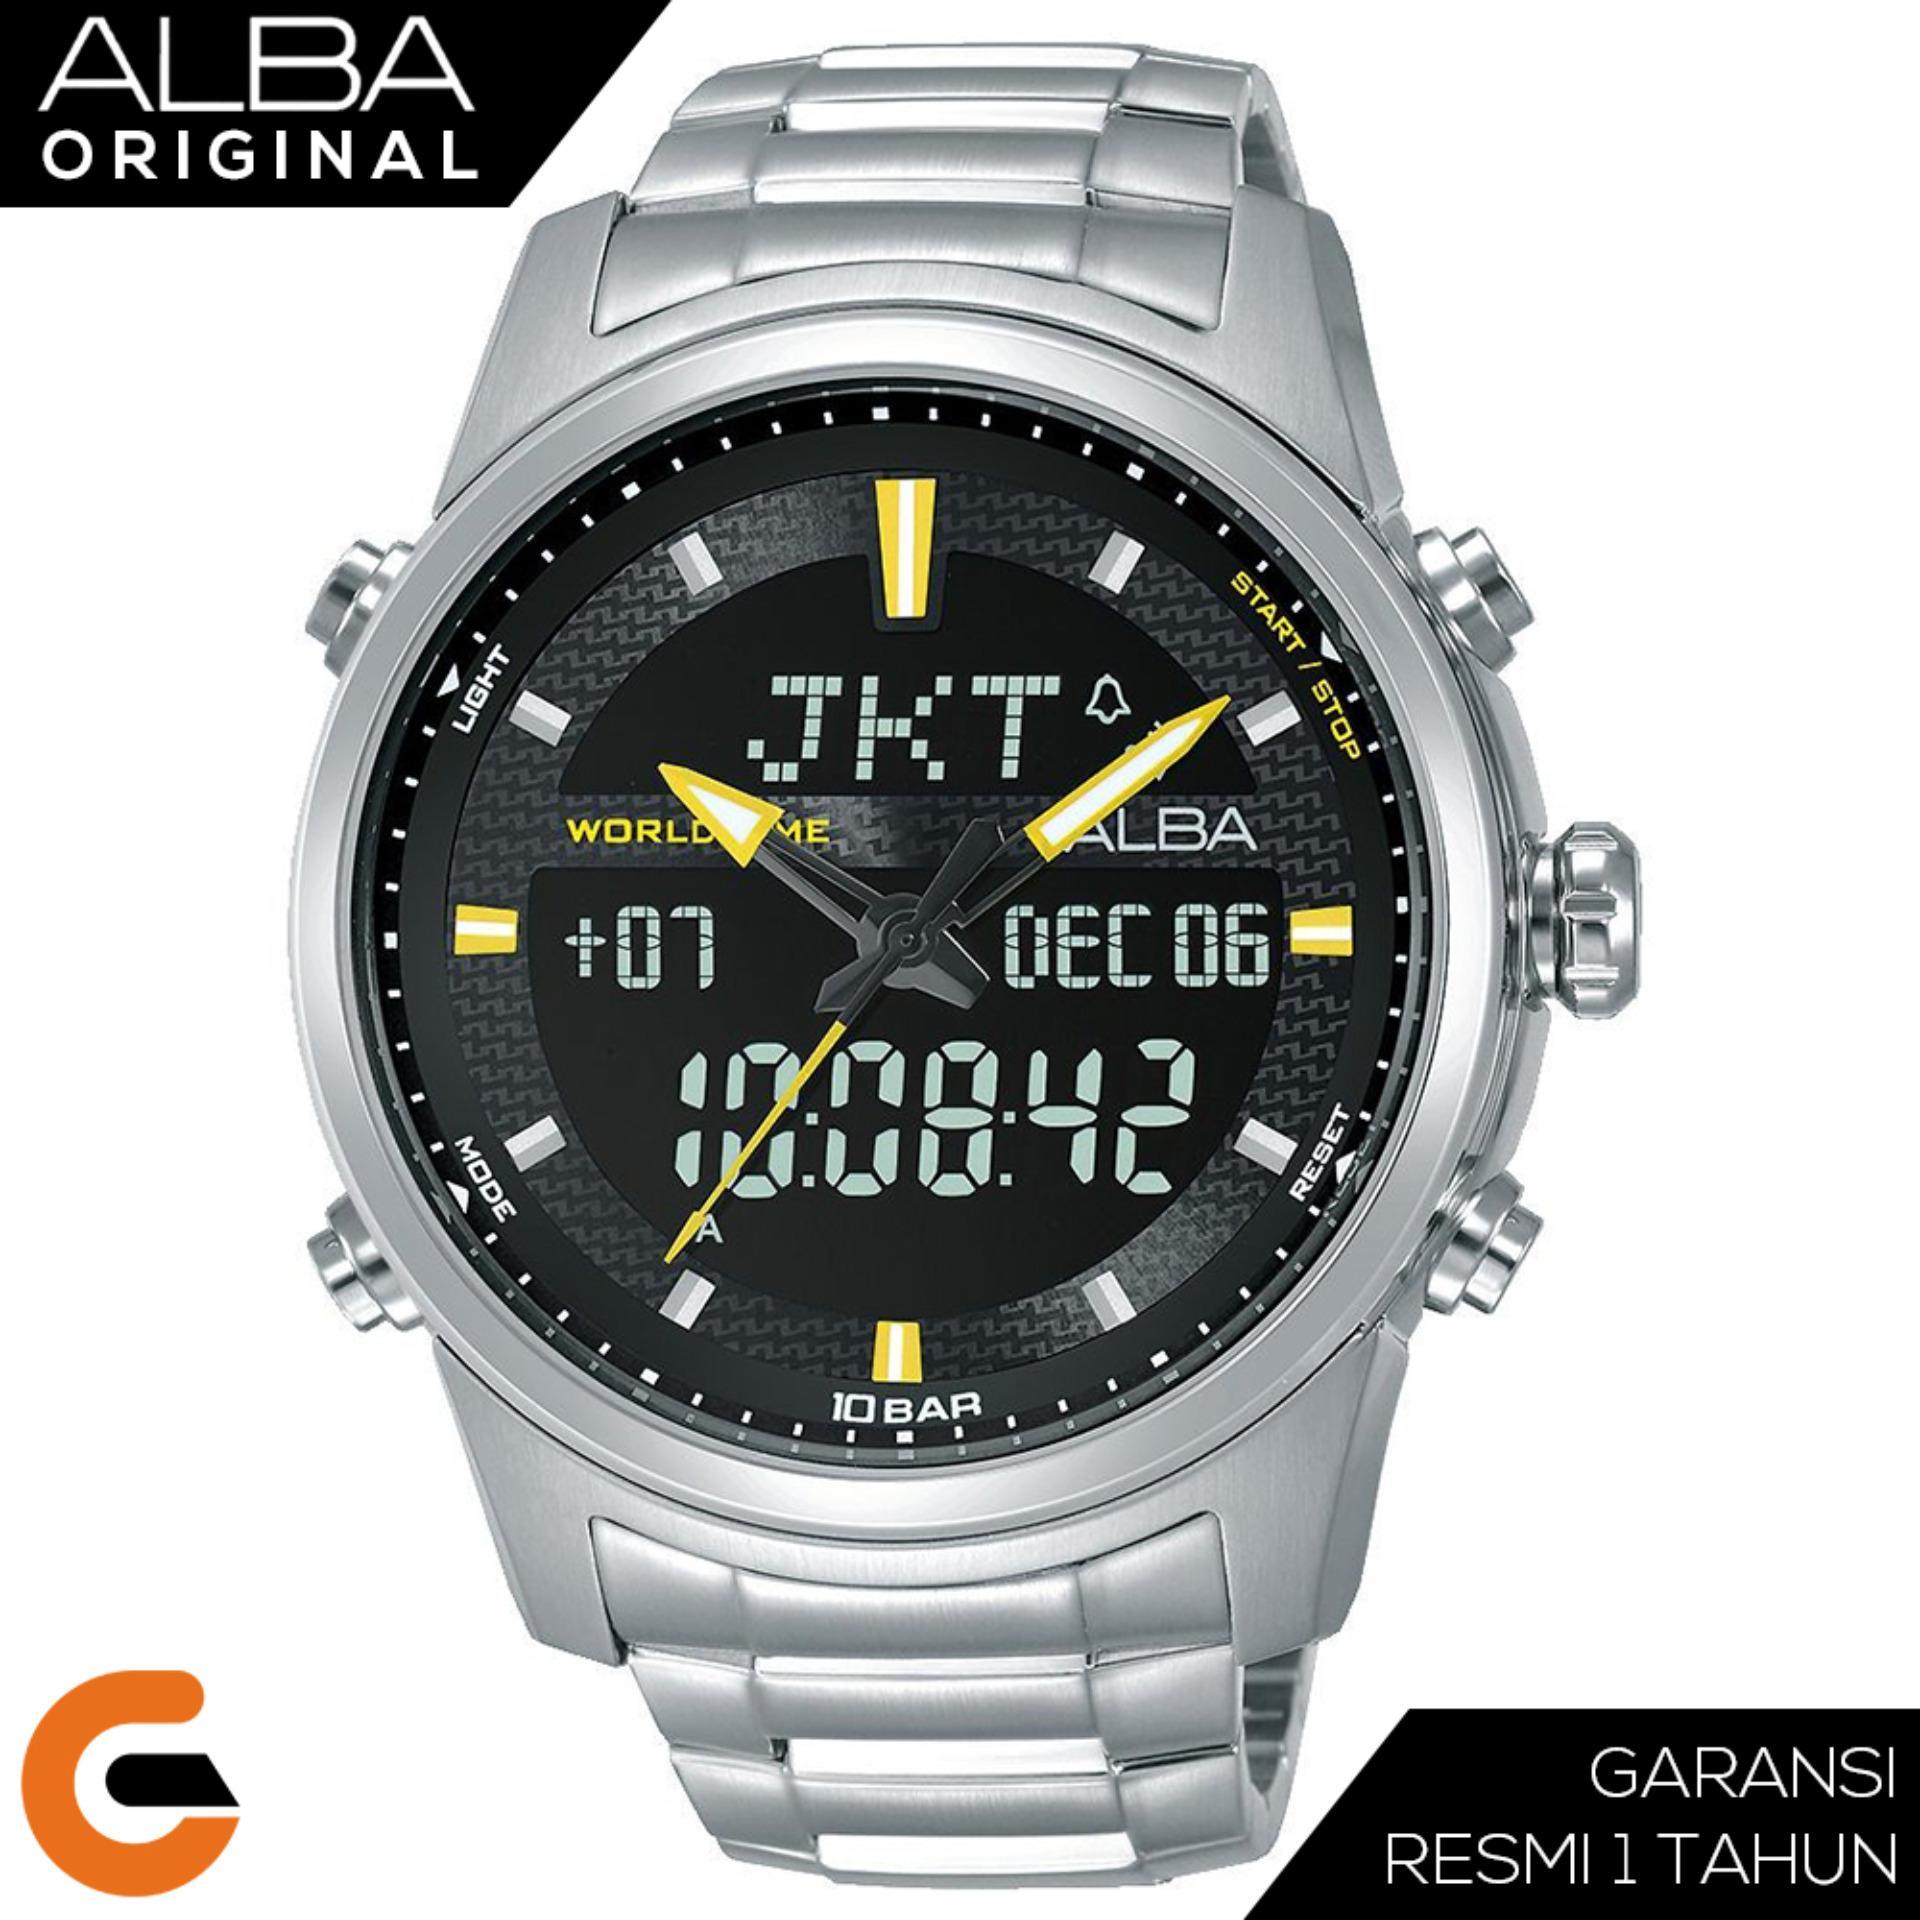 Alba Chronograph Jam Tangan Pria Dual Display Digital Analog World Time  Tali Kuli Stainless Steel AZ40 9edbb2fc46